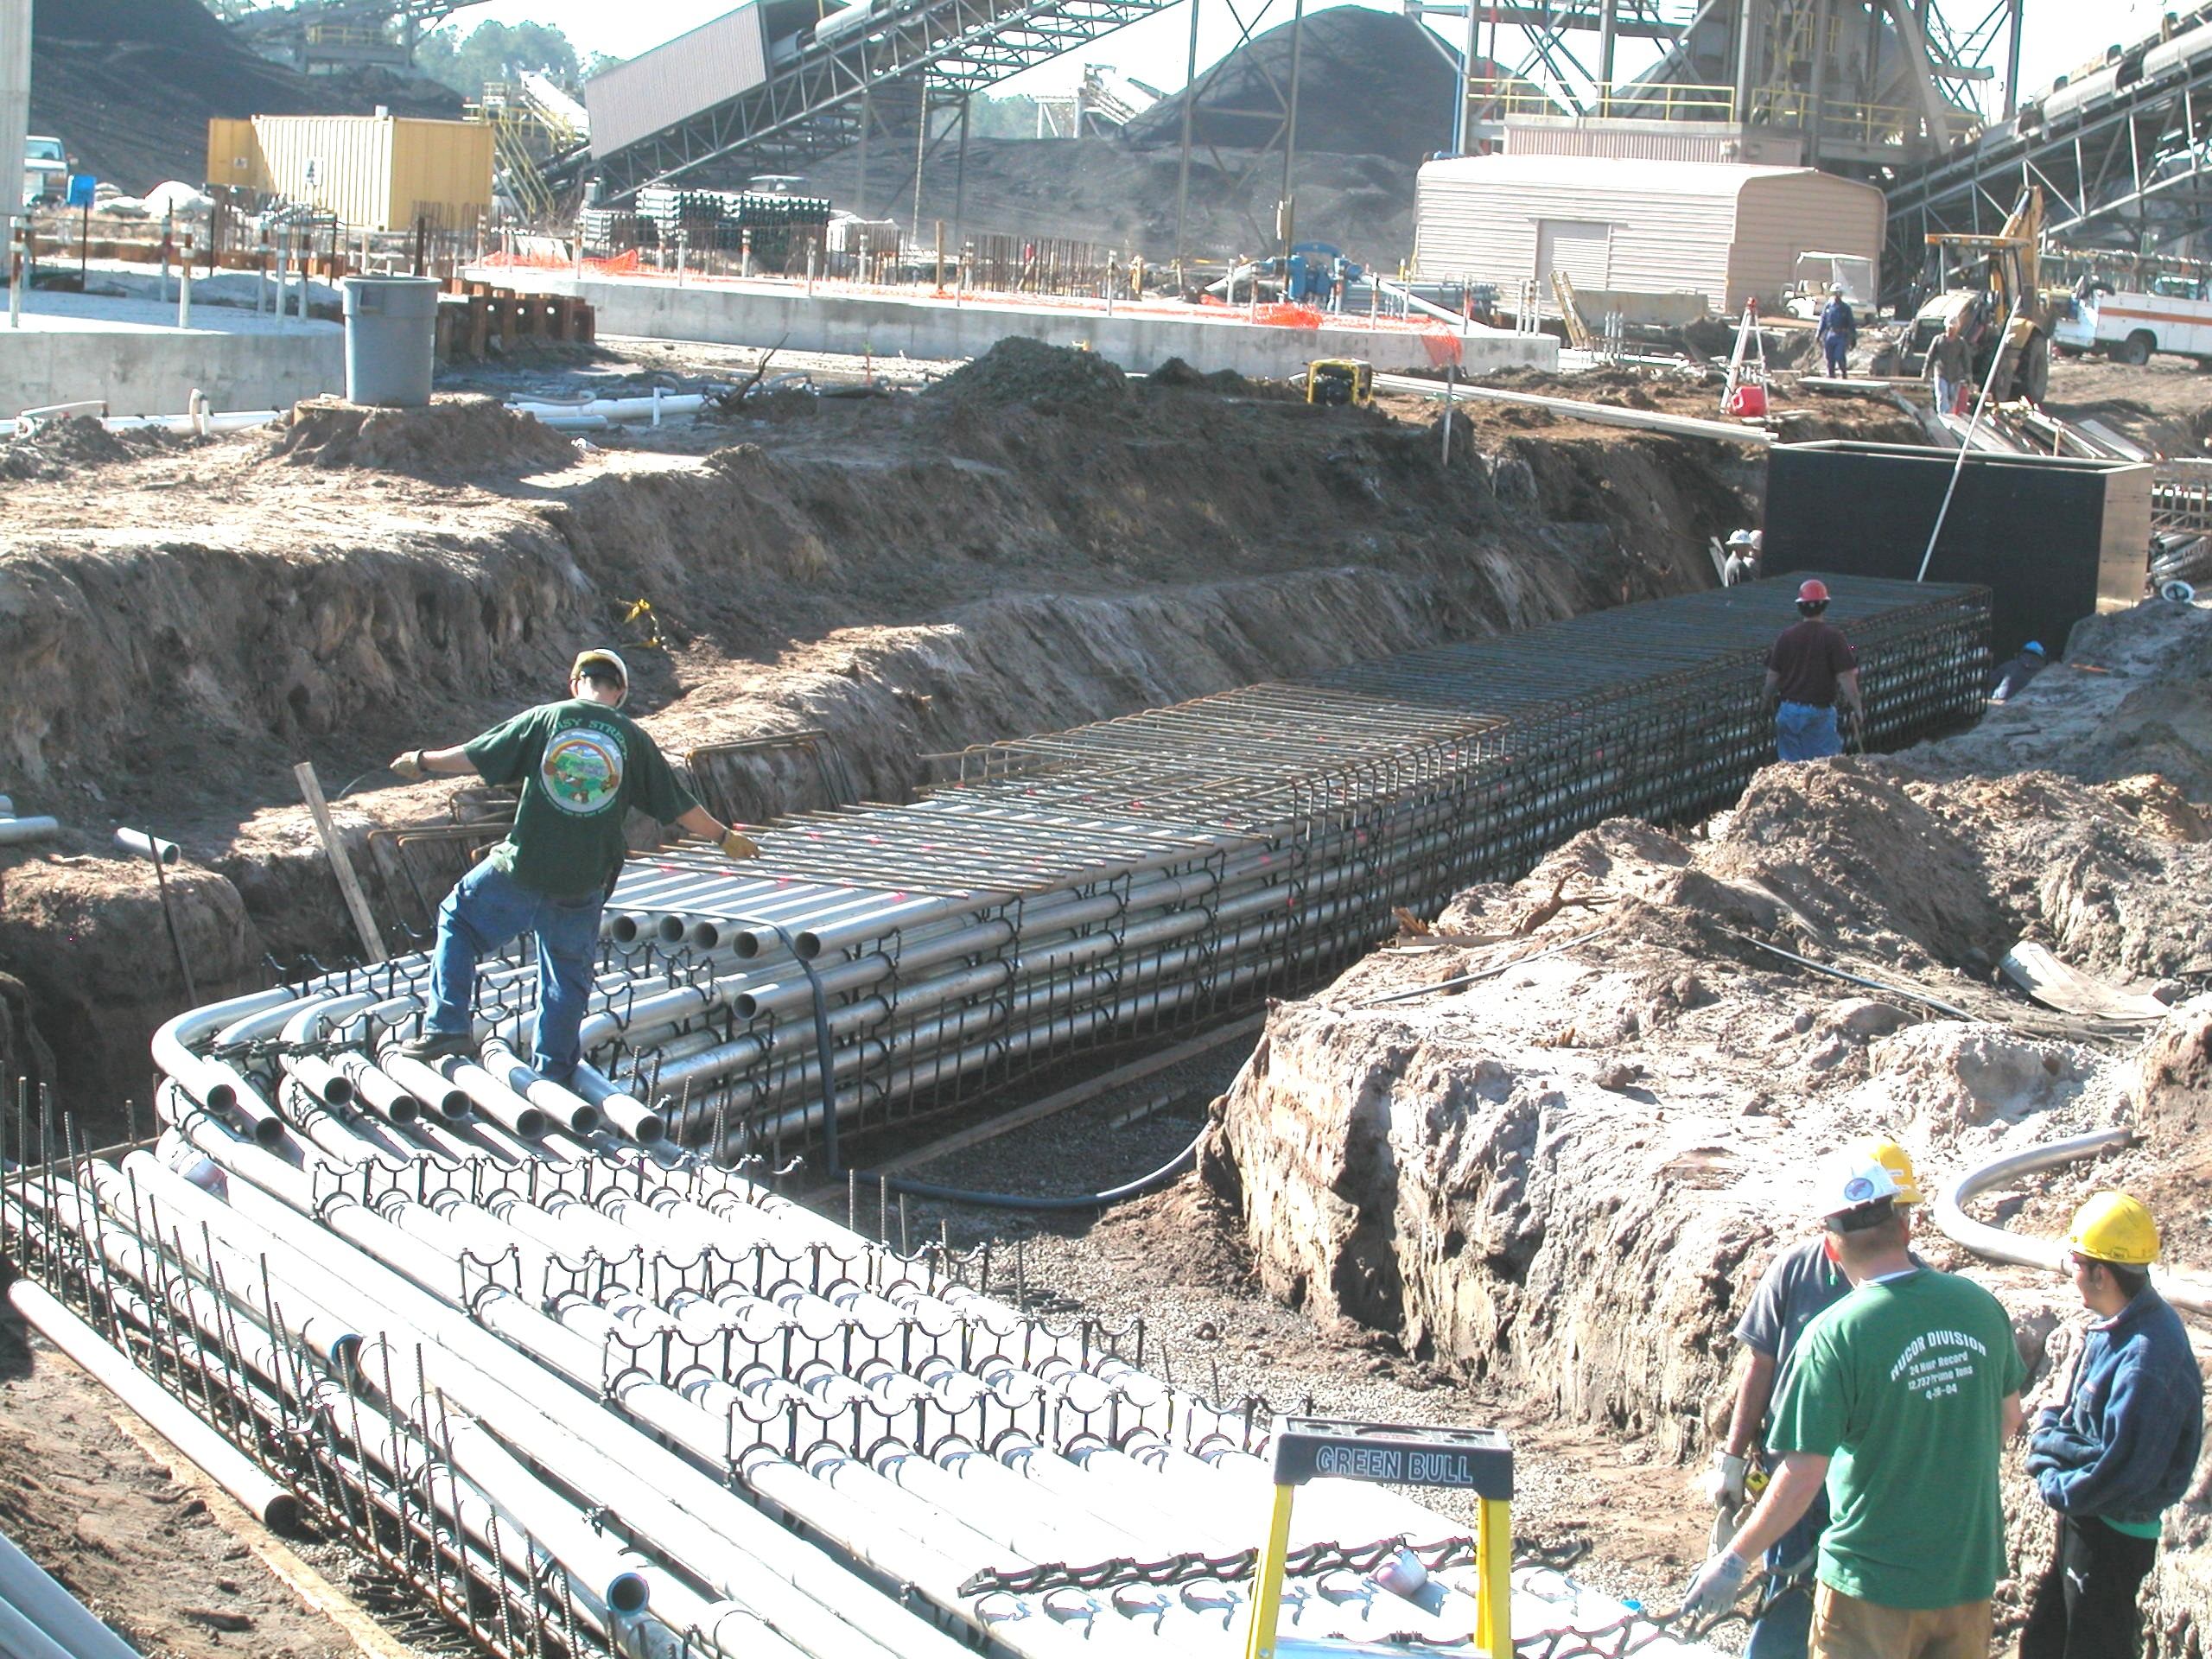 Santee Cooper Shallow Foundation 3 Landmark Construction